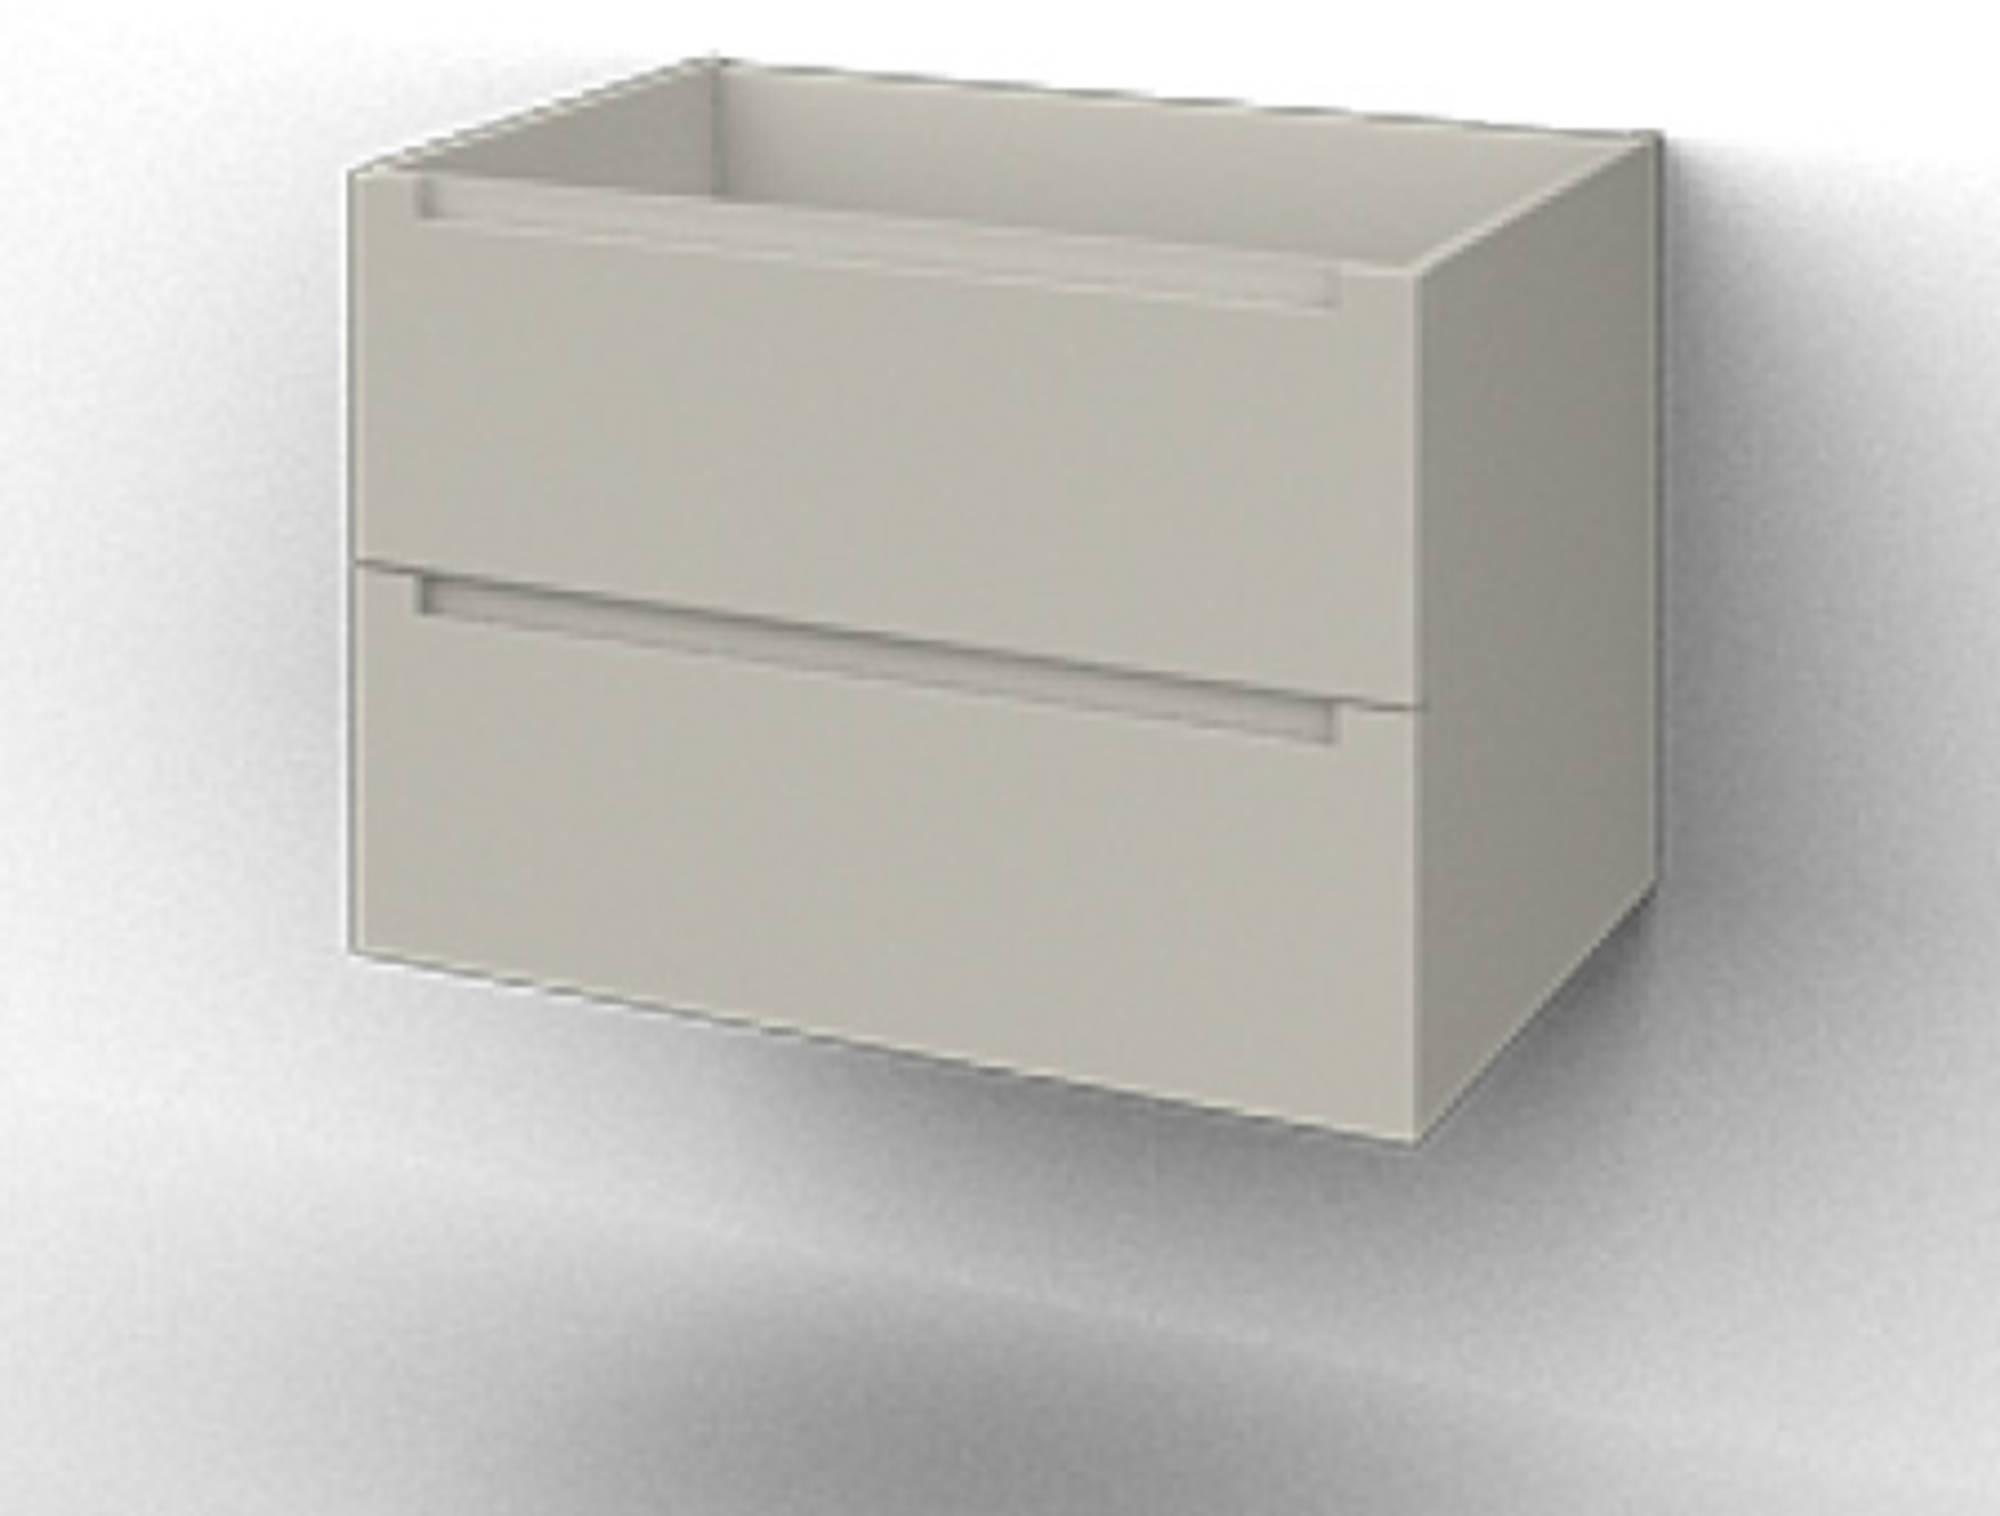 Ben Avenue Wastafelonderkast 2 lades 56x48,1x53,3 cm Mat Wit